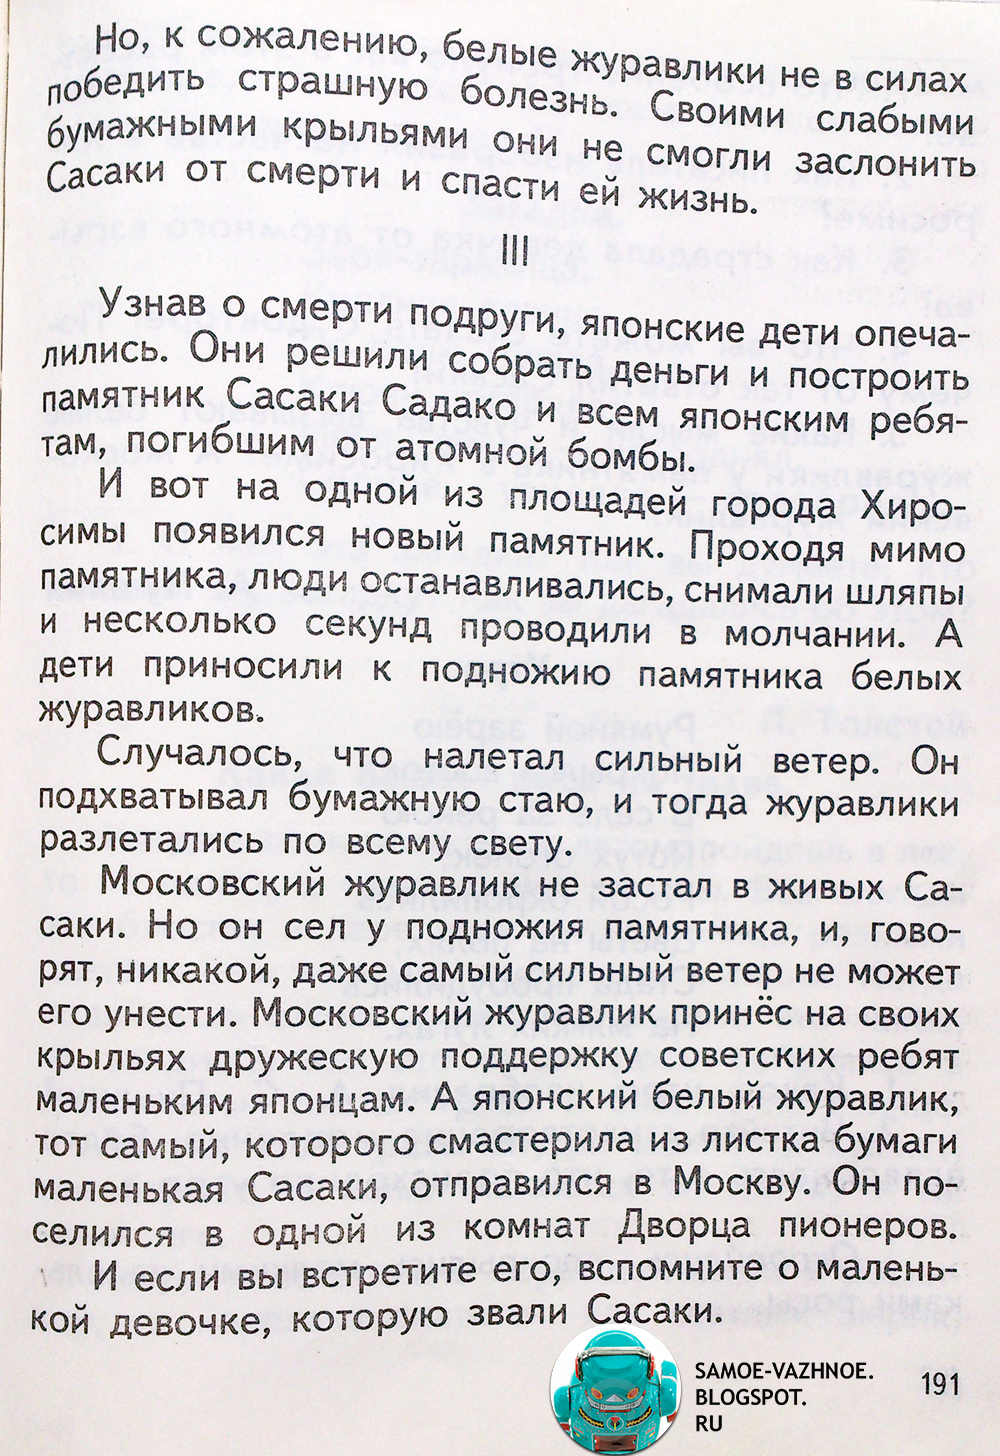 Яковлев Белые Журавлики читать онлайн учебник скан Сасаки Садако Хиросима оригами